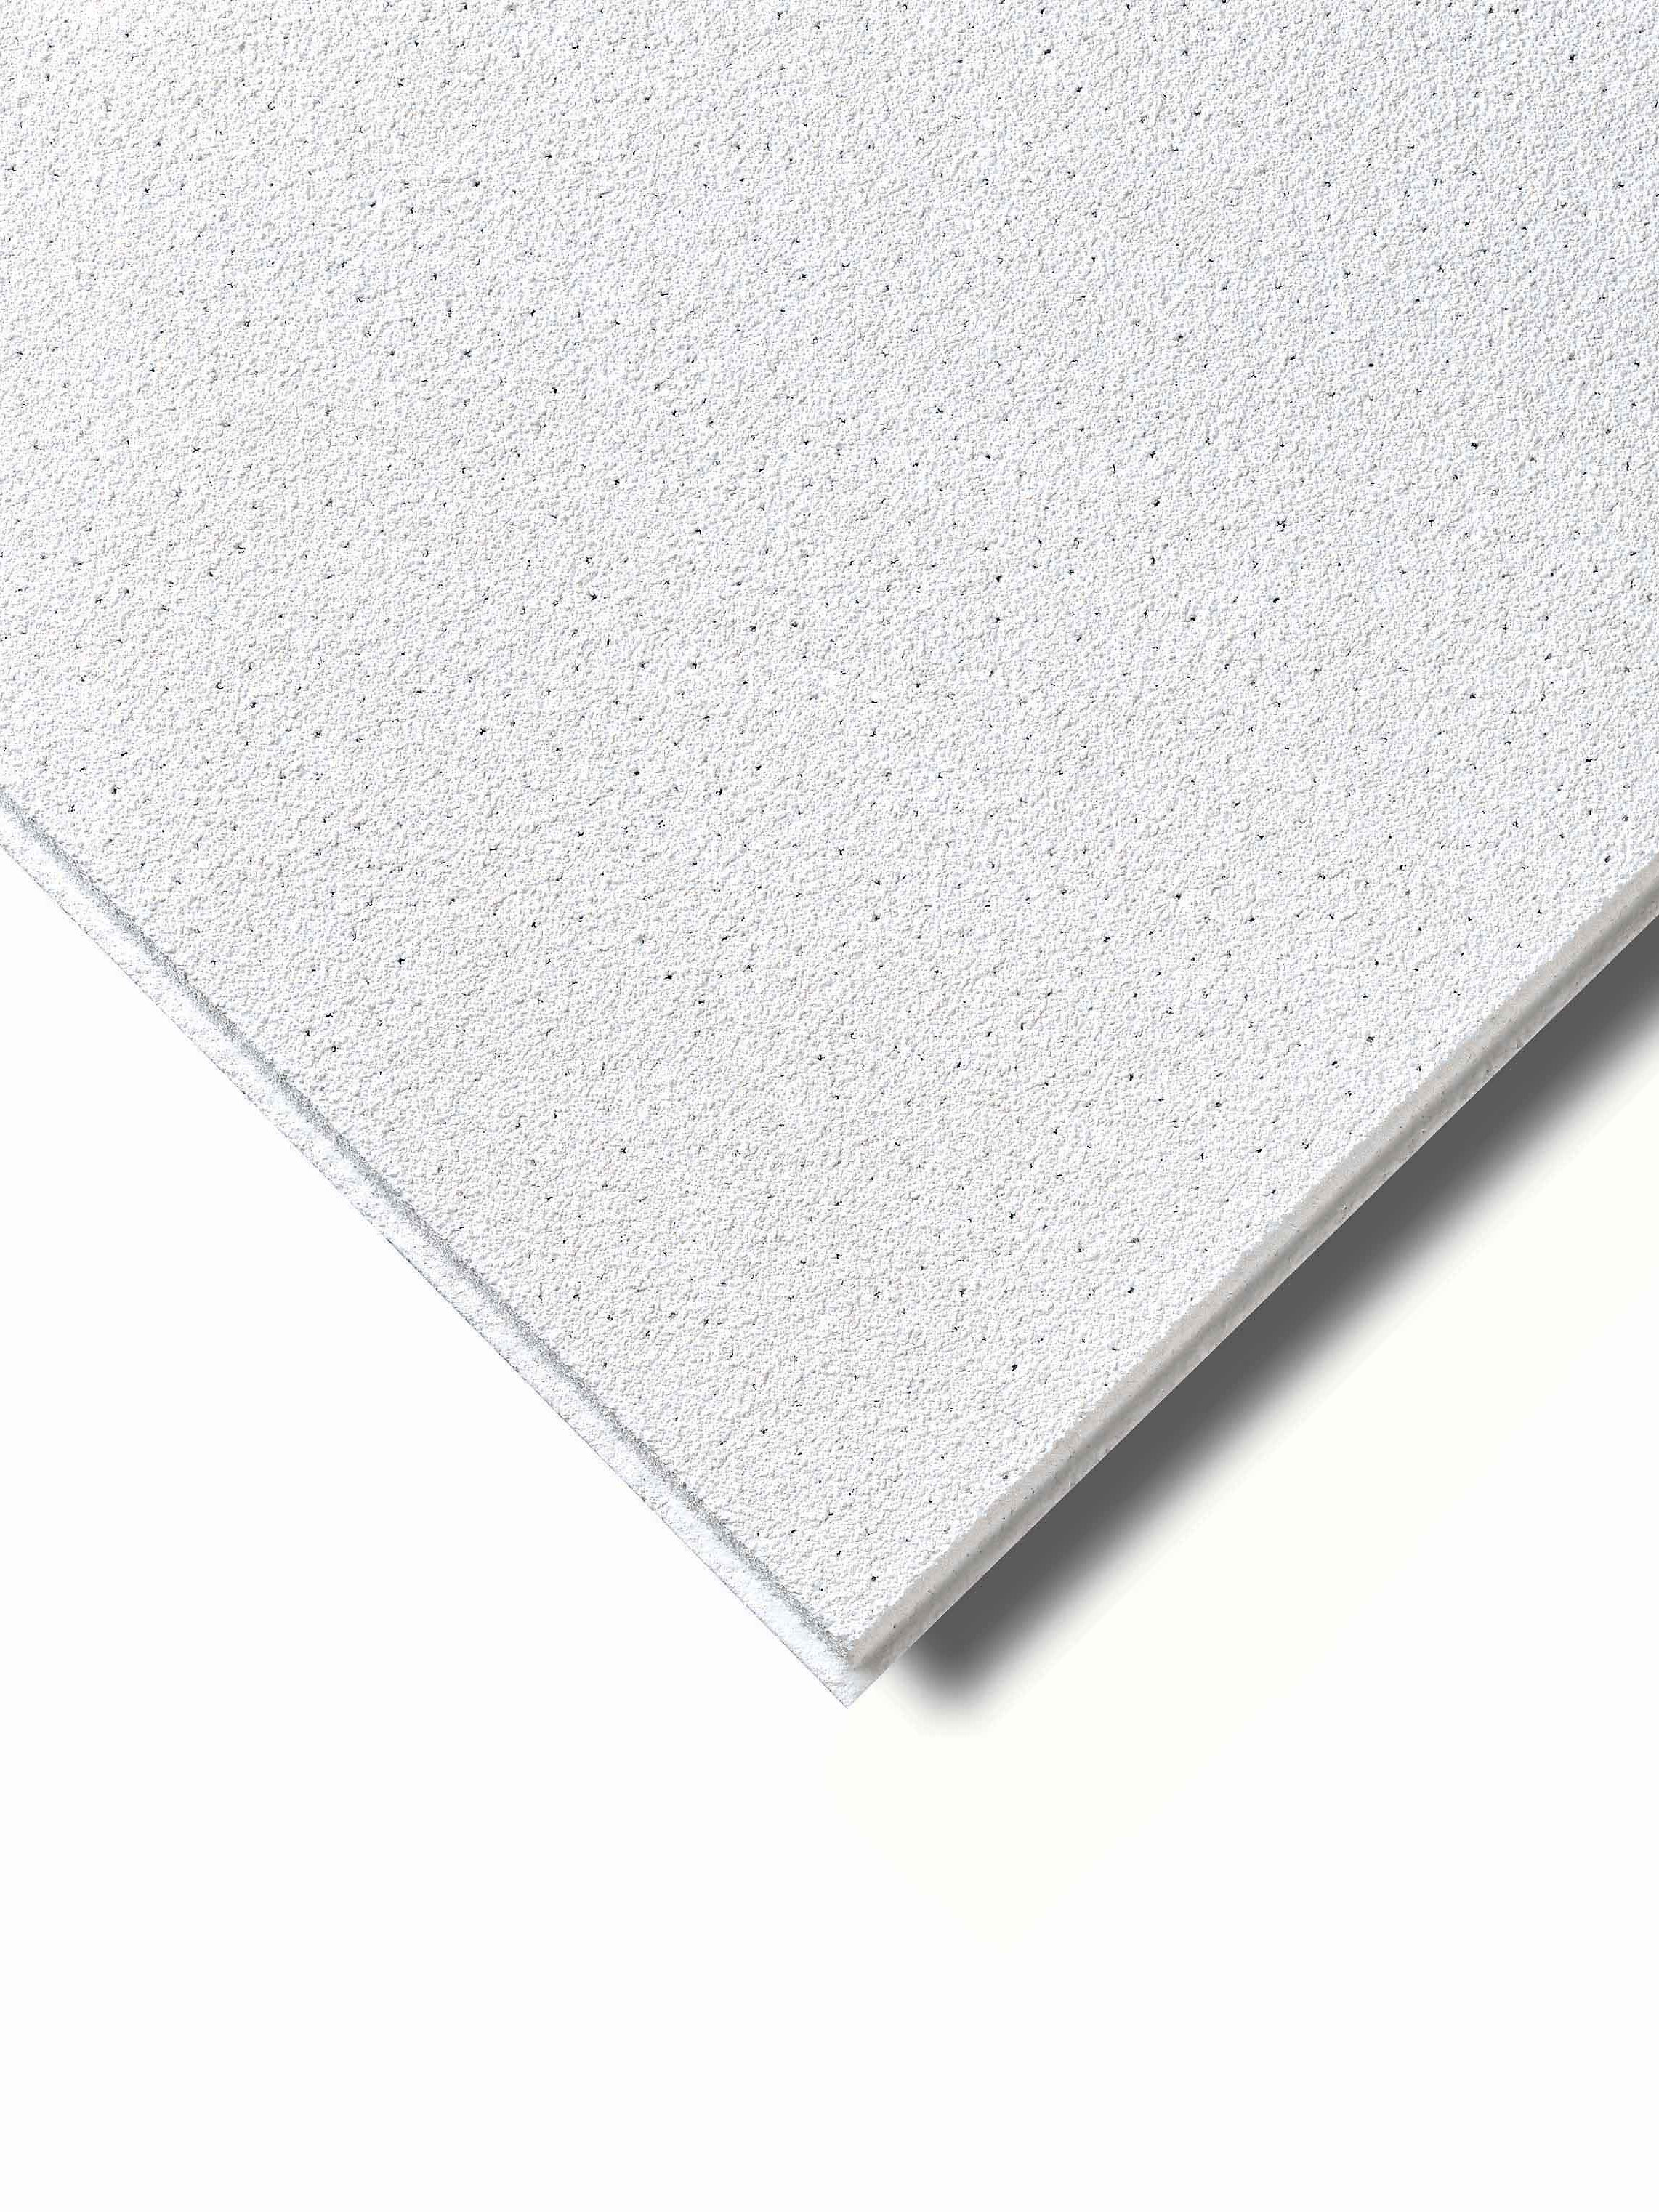 Ukceilingtilesuppliesceilingtiles dune supreme ceiling tile ml microlook 600x600 awi bp2274 perf 16nr per box doublecrazyfo Images